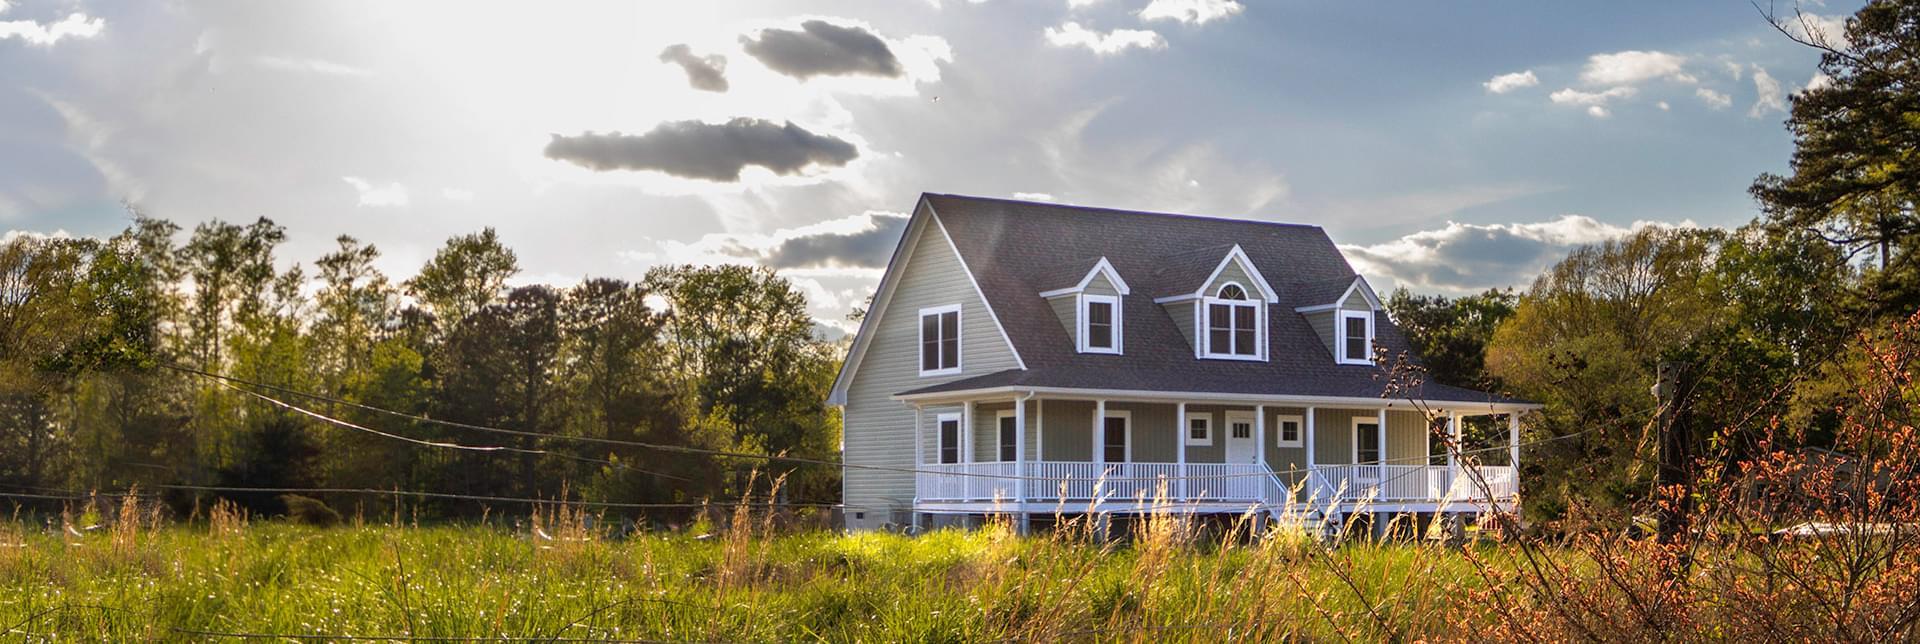 New Homes in Northampton County NC